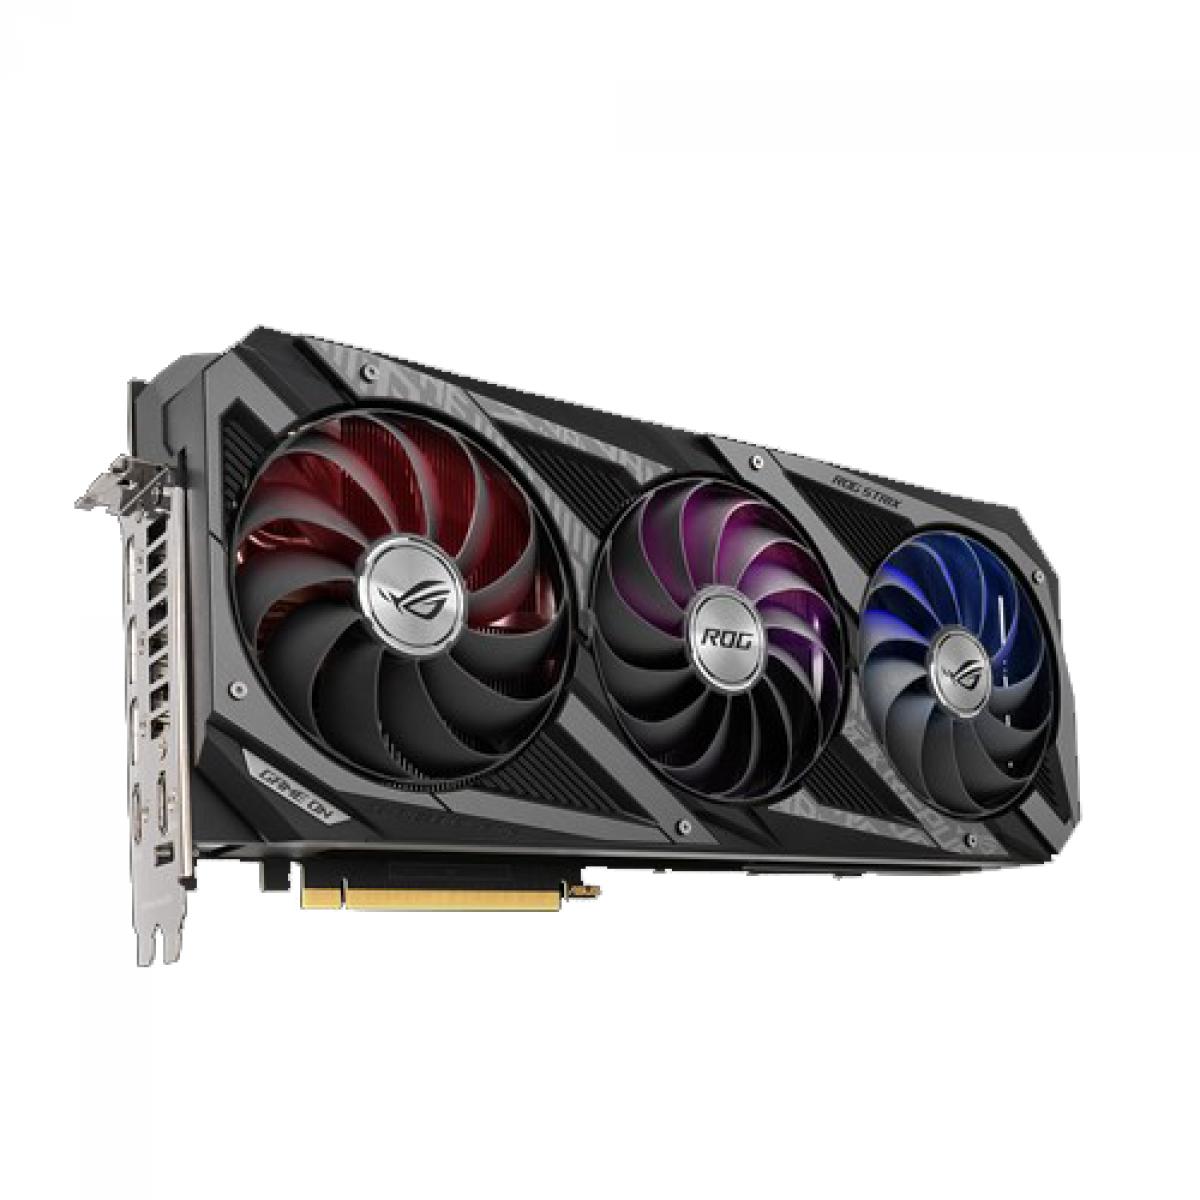 Placa de Vídeo Asus ROG Strix Geforce, RTX 3090, 24GB, GDDR6X, 384bit, ROG-STRIX-RTX3090-24G-GAMING